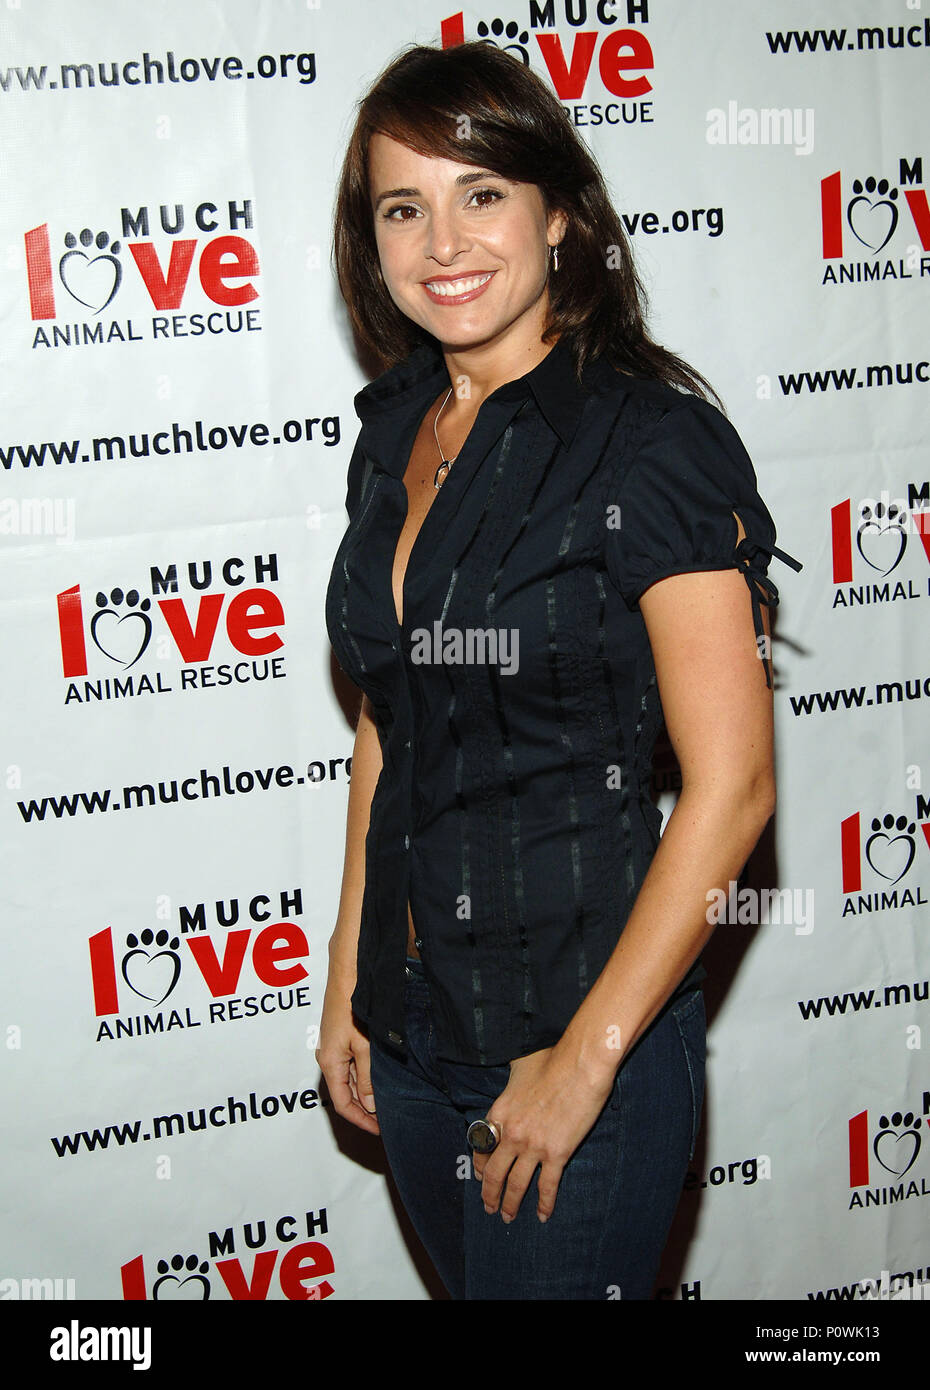 Jacqueline Obradors - Celebrity Gossip, Latest Movie ...